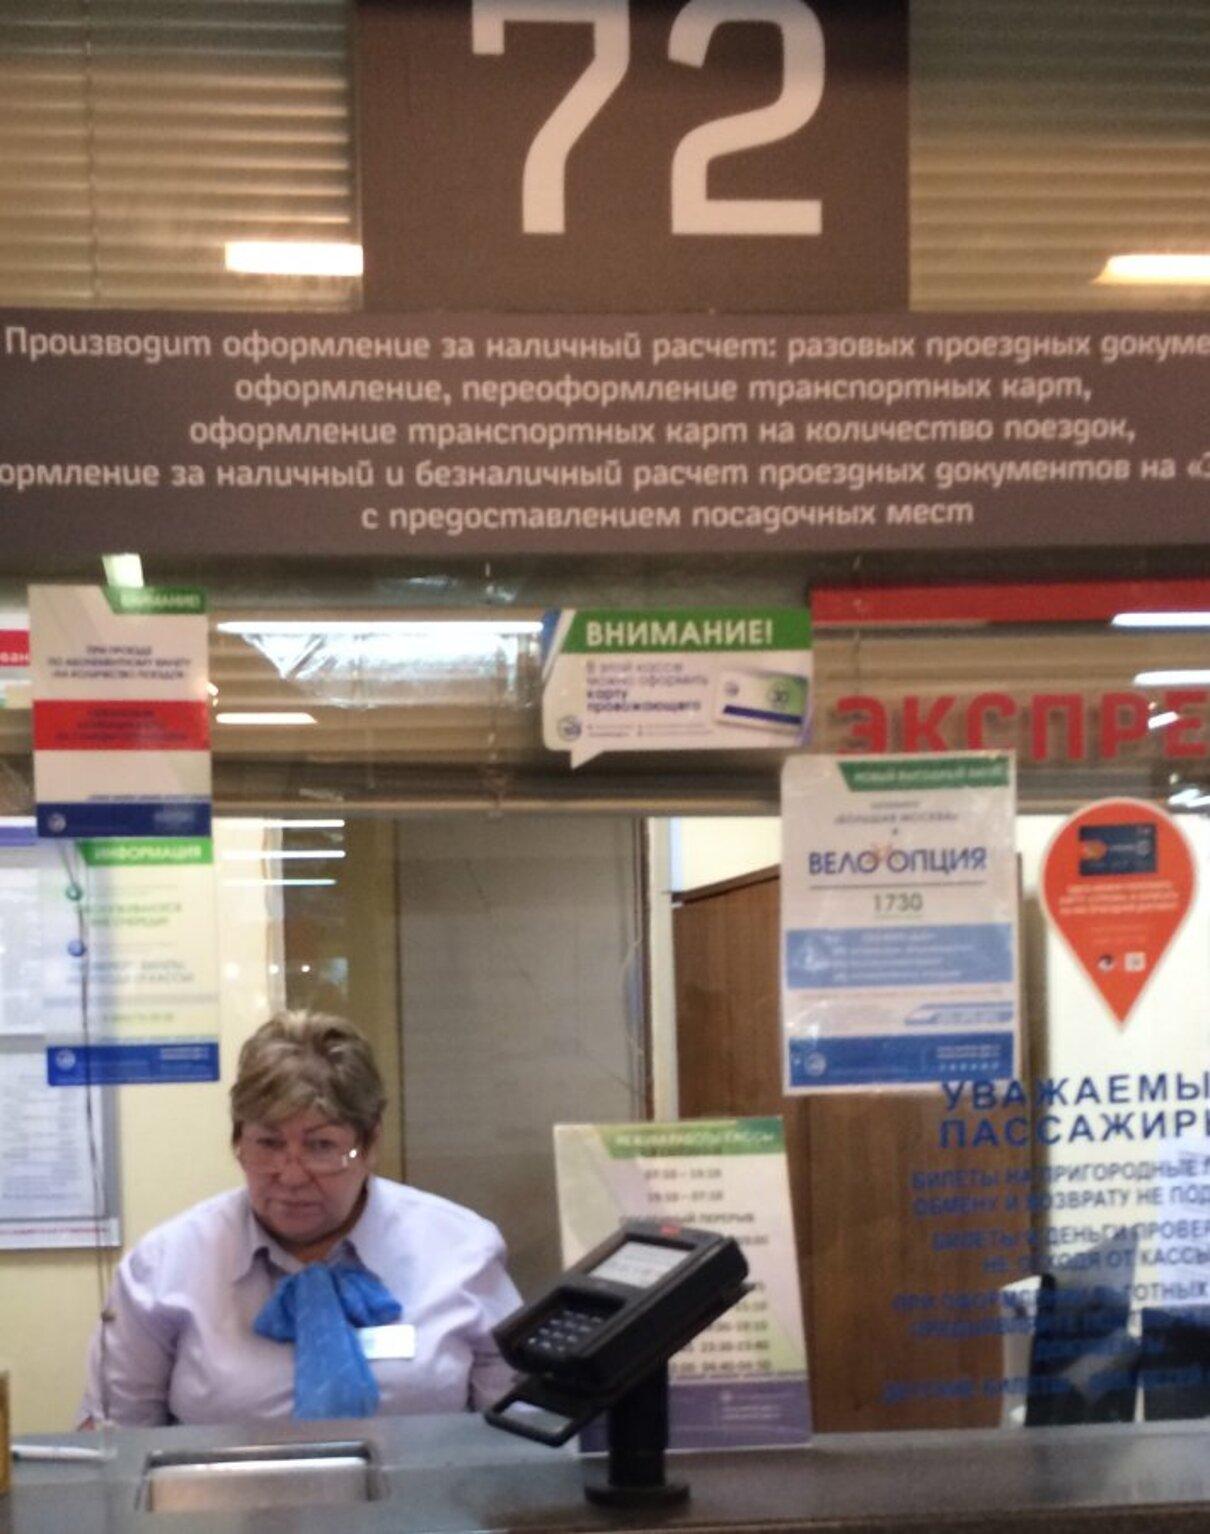 Жалоба-отзыв: Кассир на Курском вокзале, касса 72 - Хамство кассира РЖД.  Фото №1